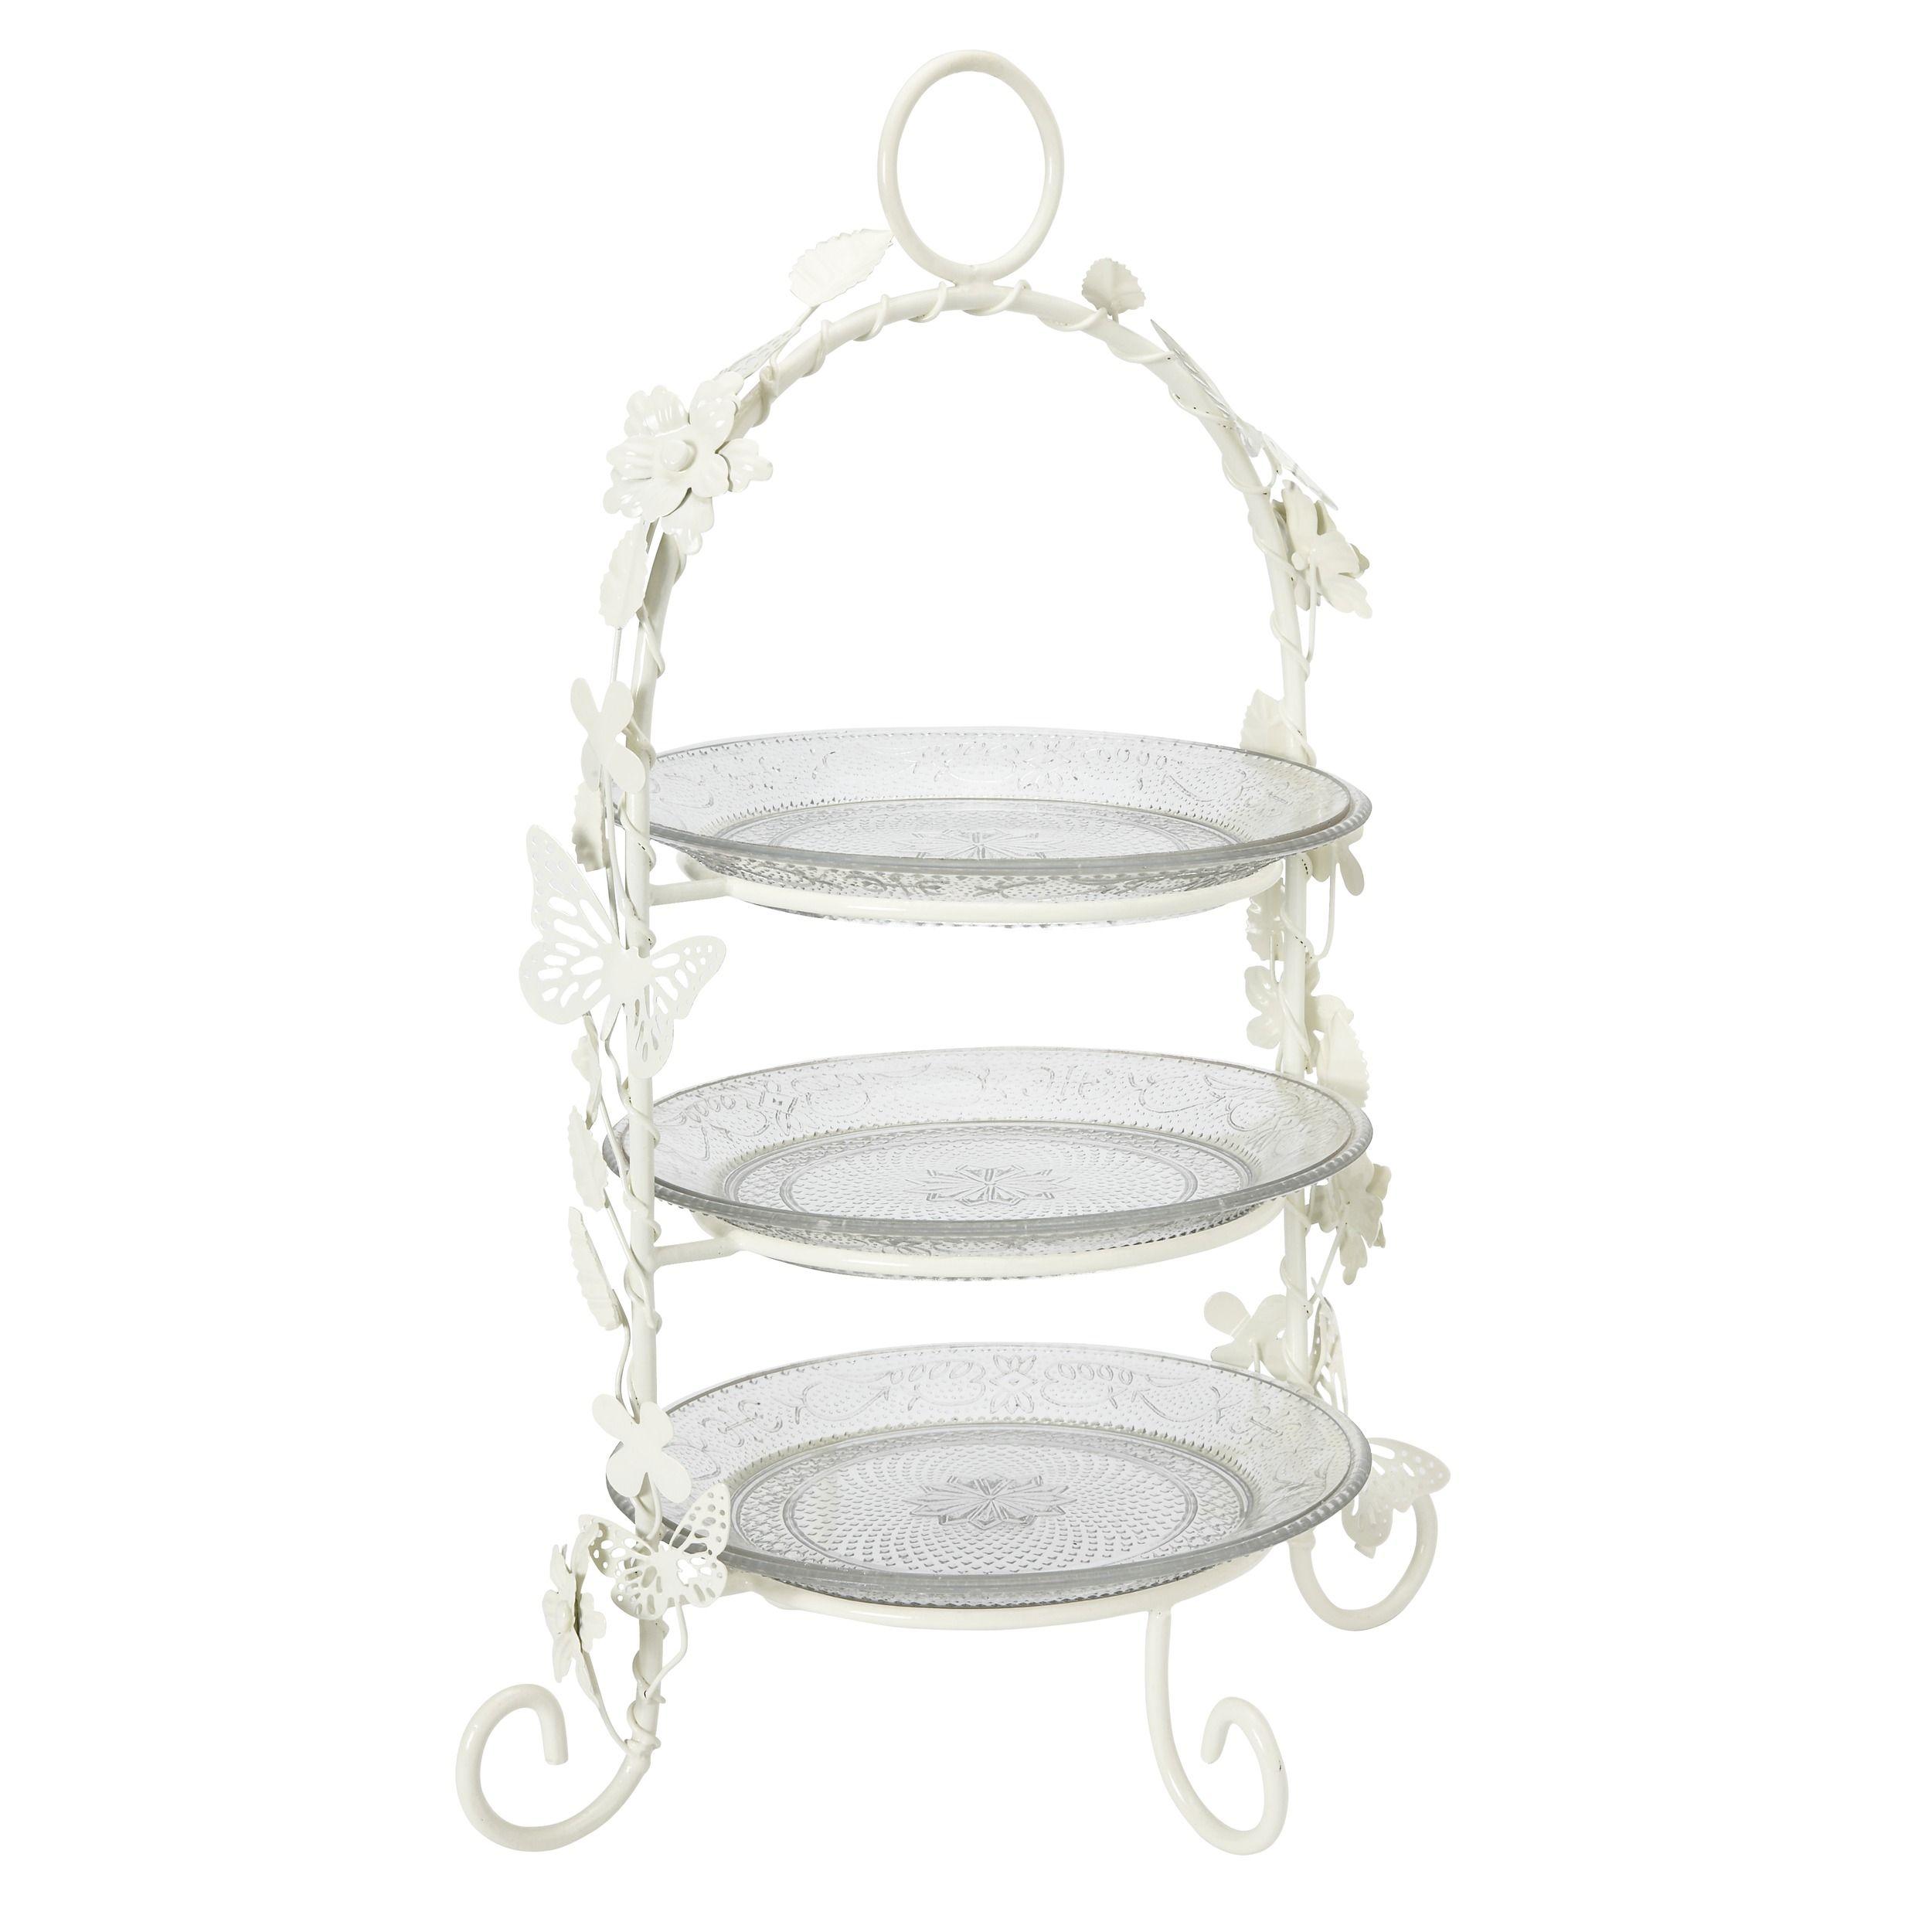 3 tier cream enamel high tea cake stand baking